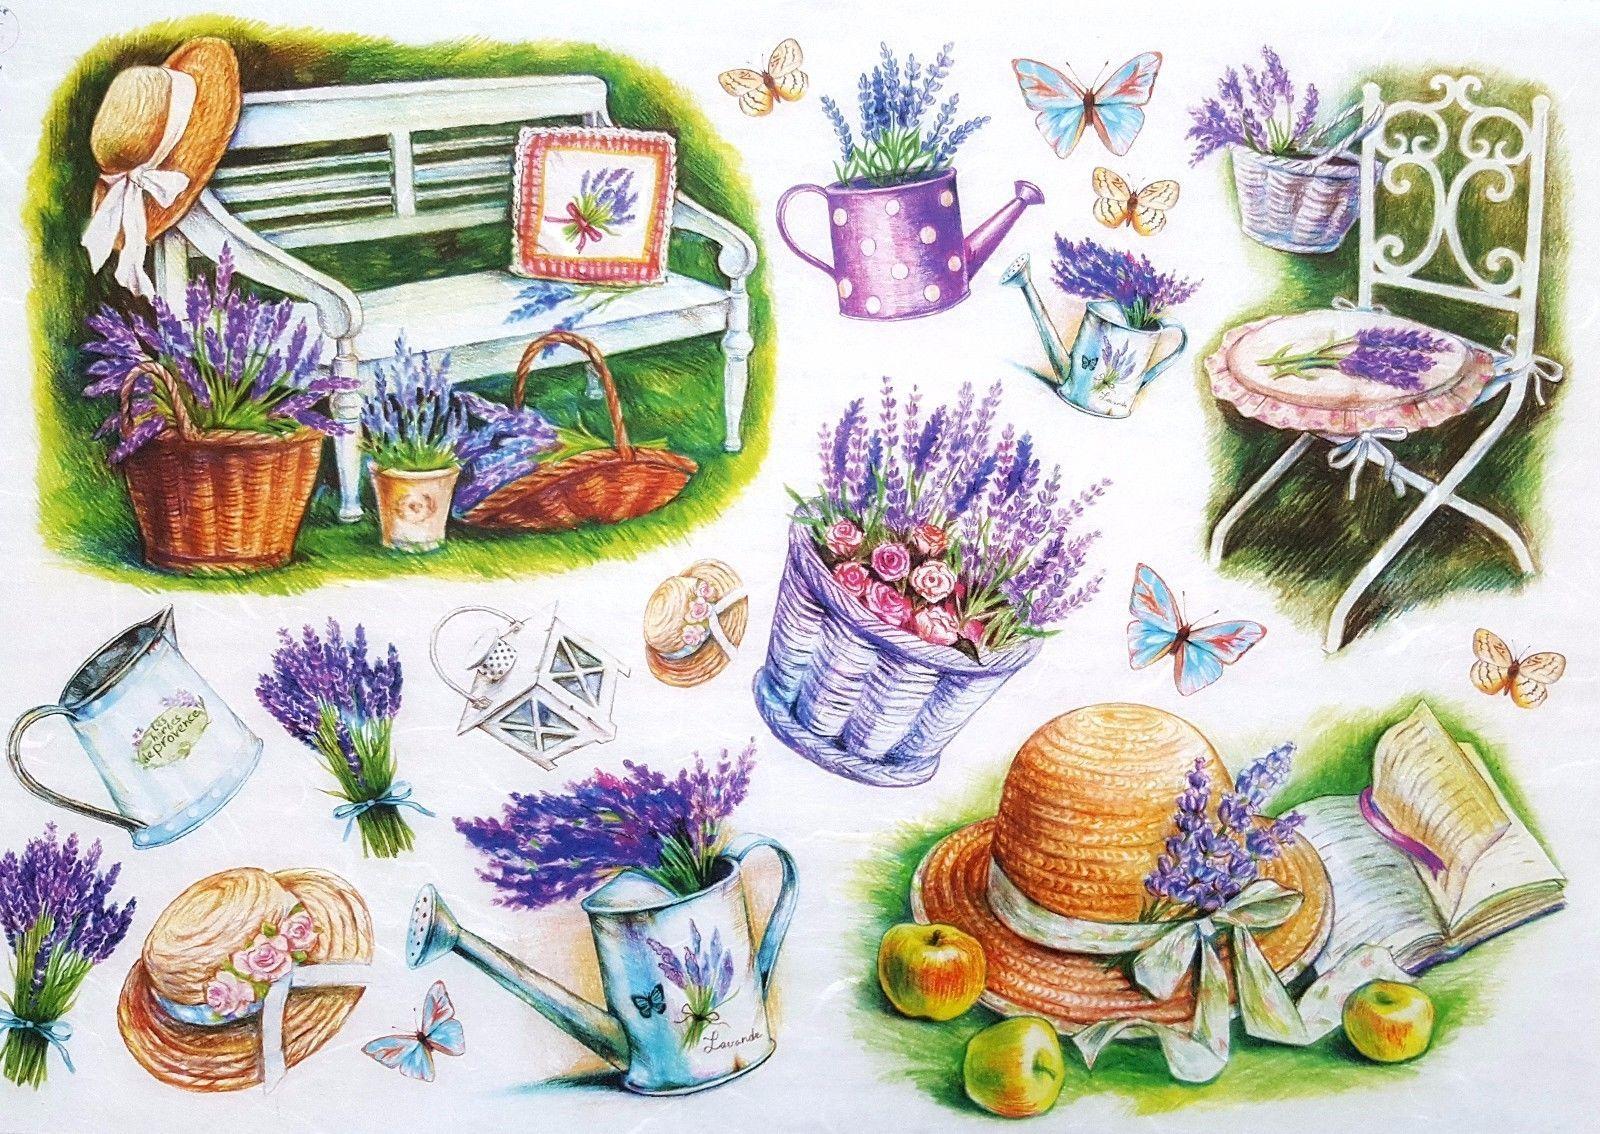 Rice Paper for Decoupage Decopatch Scrapbooking Sheet Craft Vintage Garden Laven